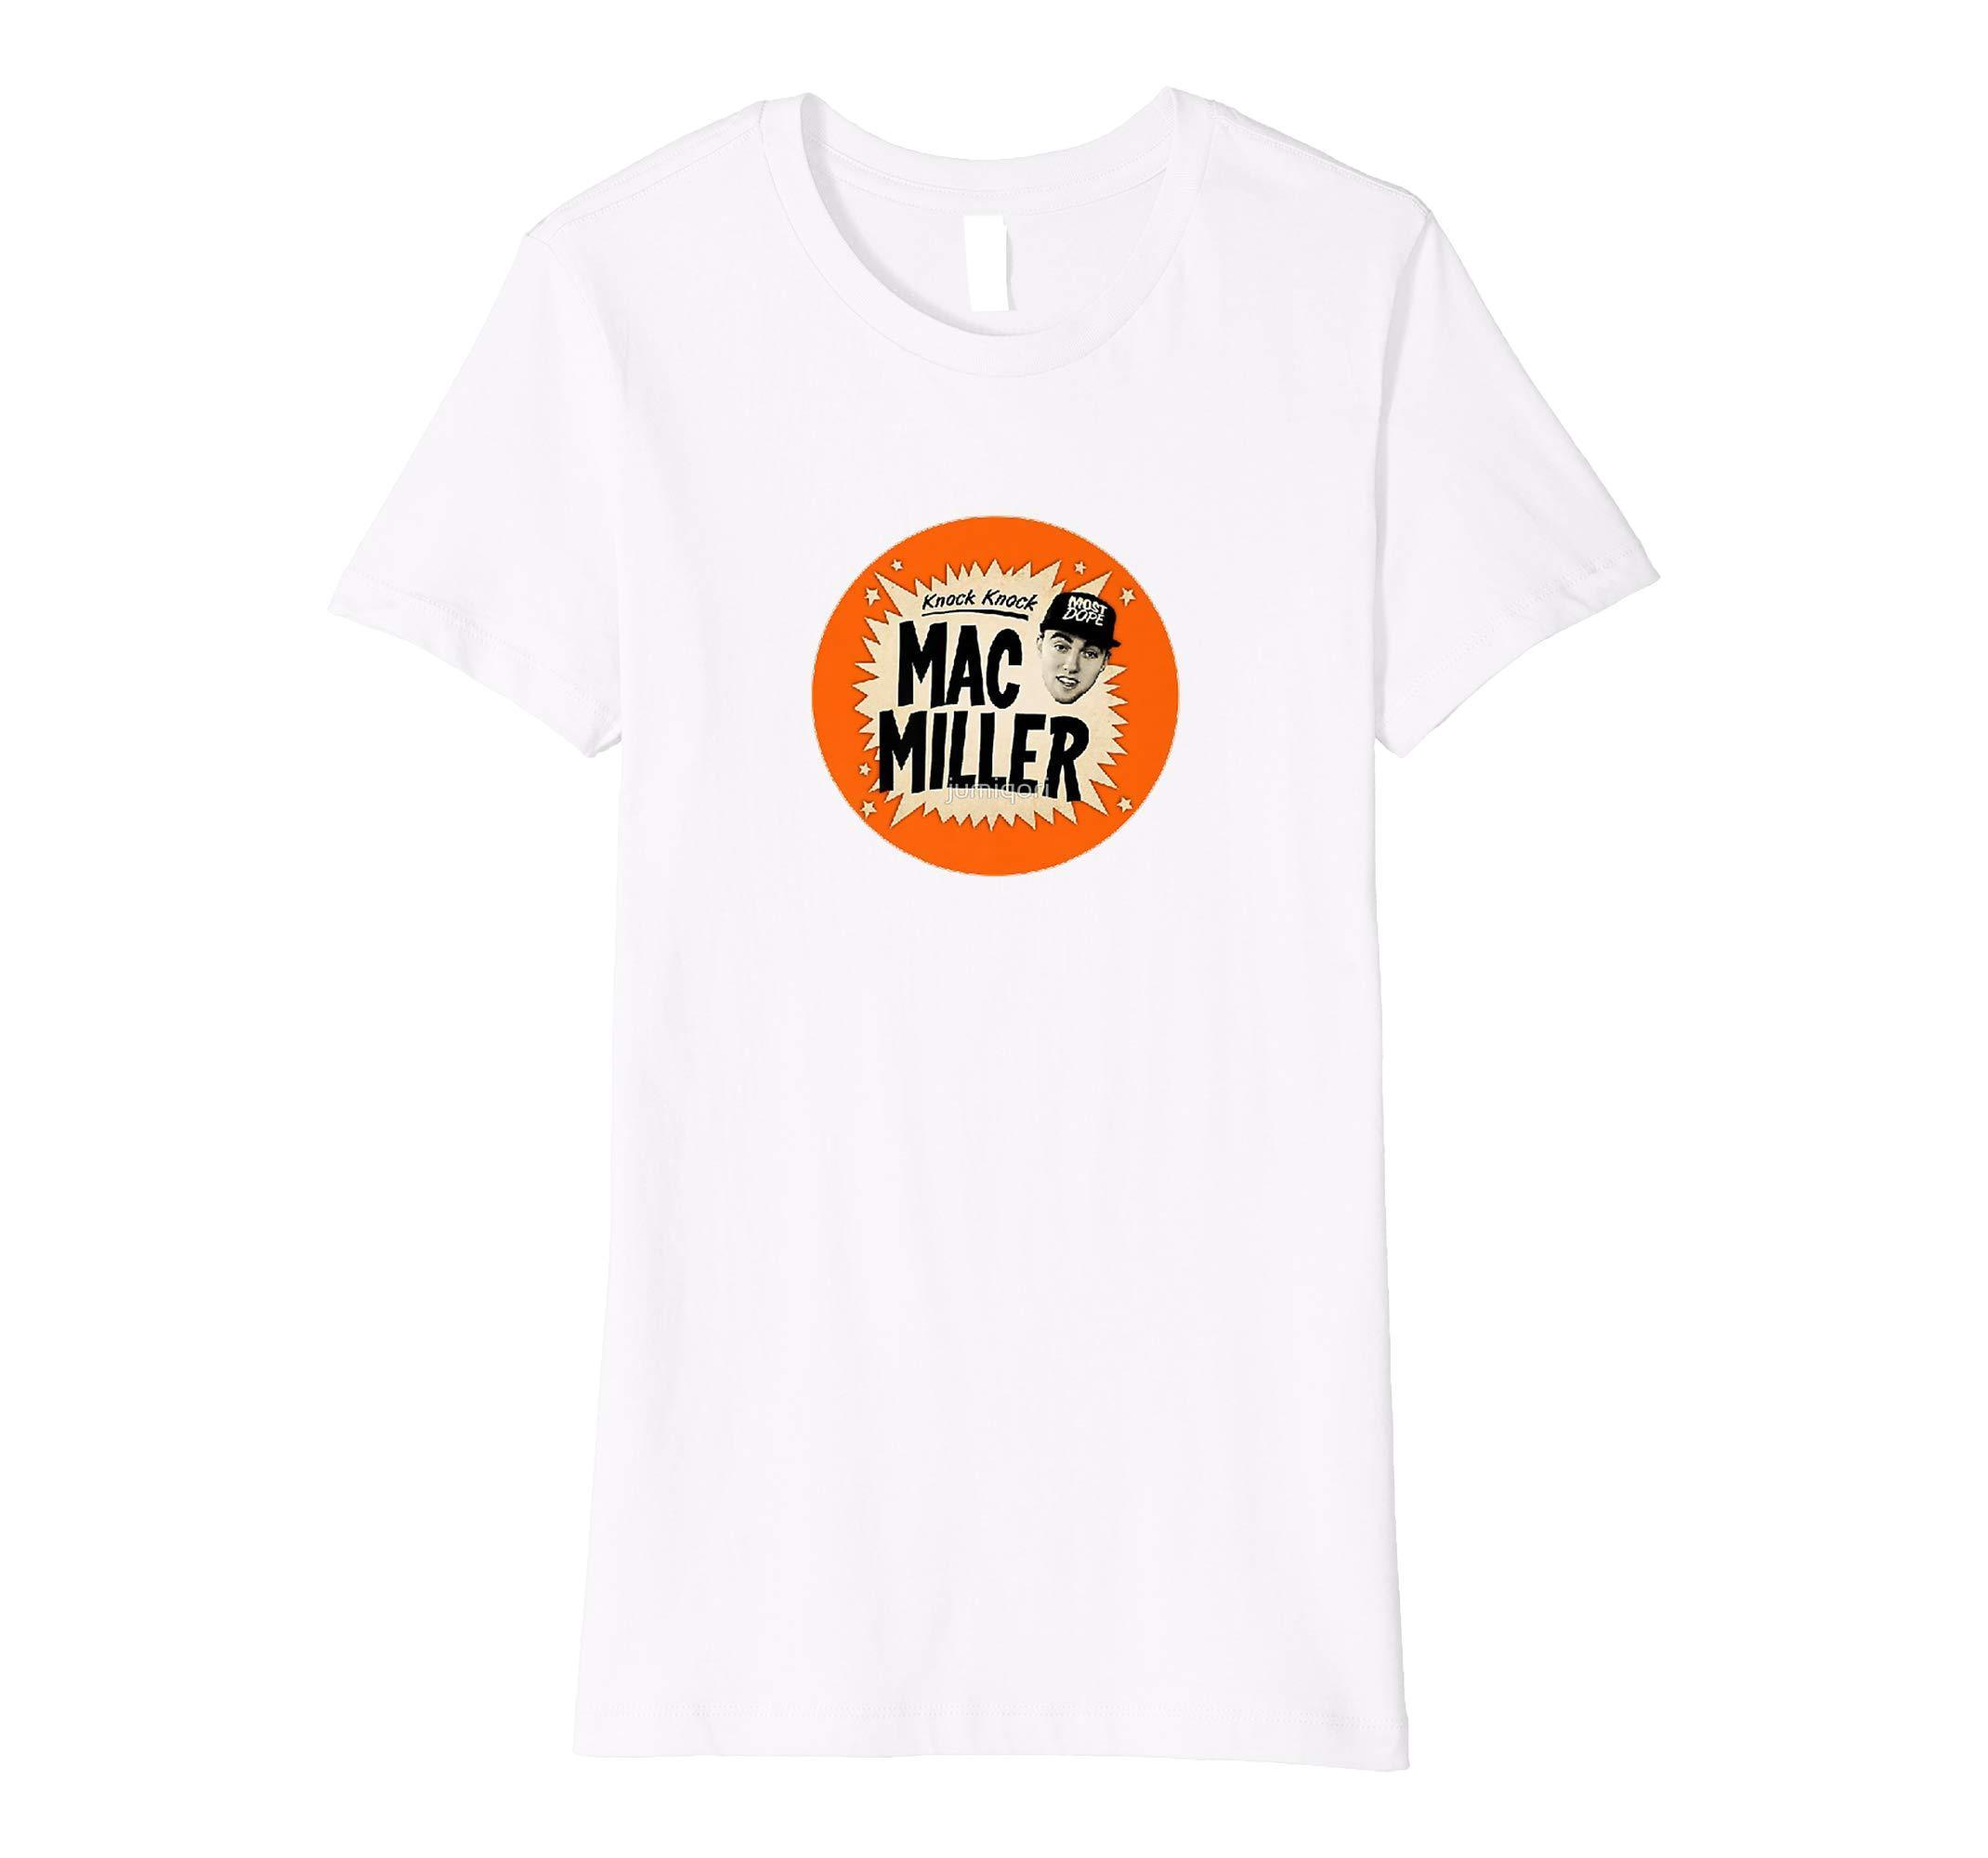 Buy S T Shirt Mac Miller Rip 1992 2018 Gift